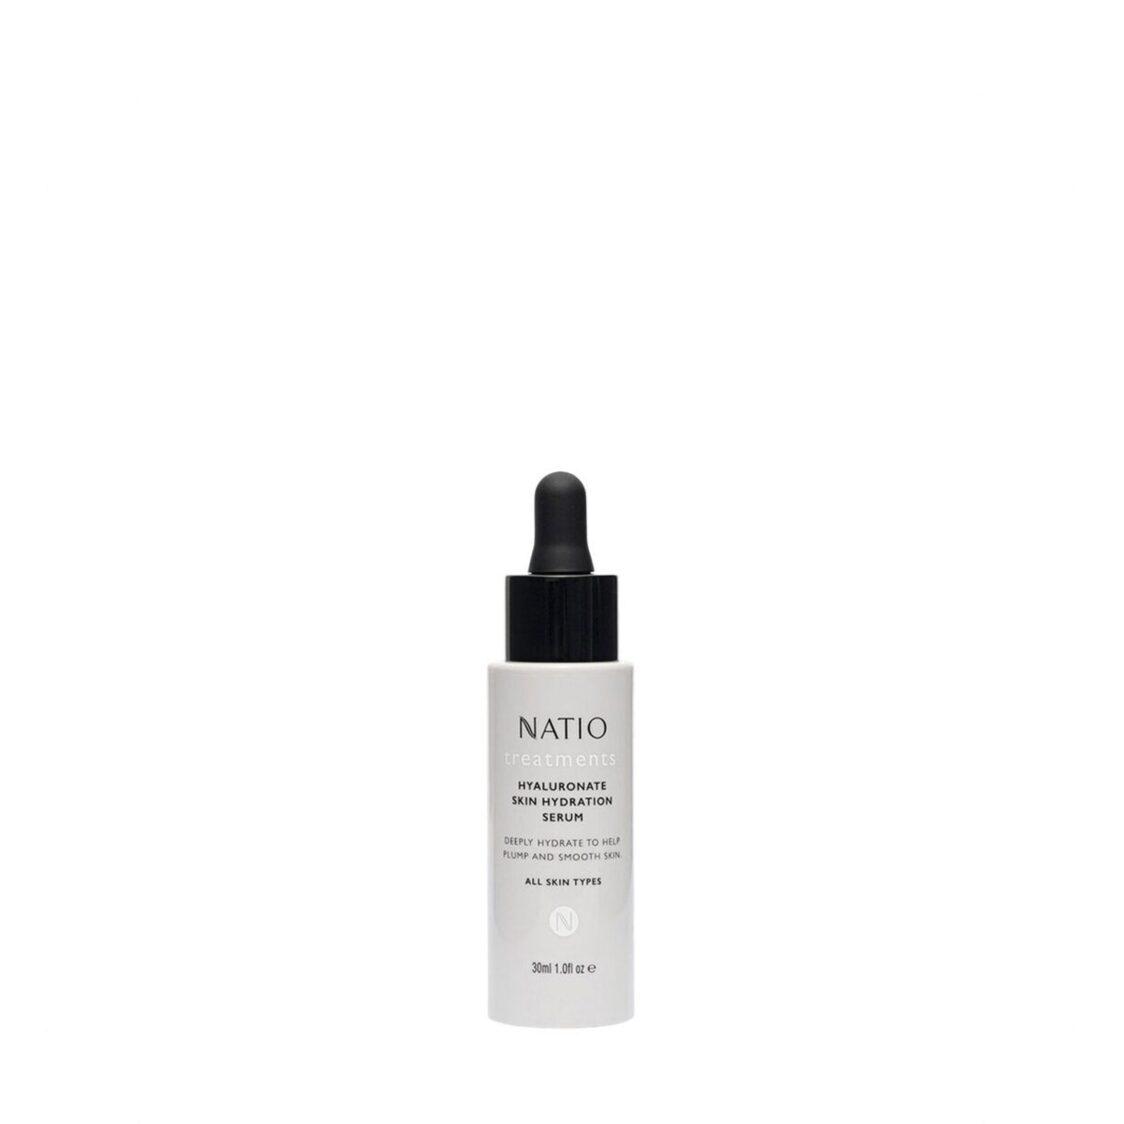 Natio Treatments Hyaluronate Skin Hydration Serum 30ml